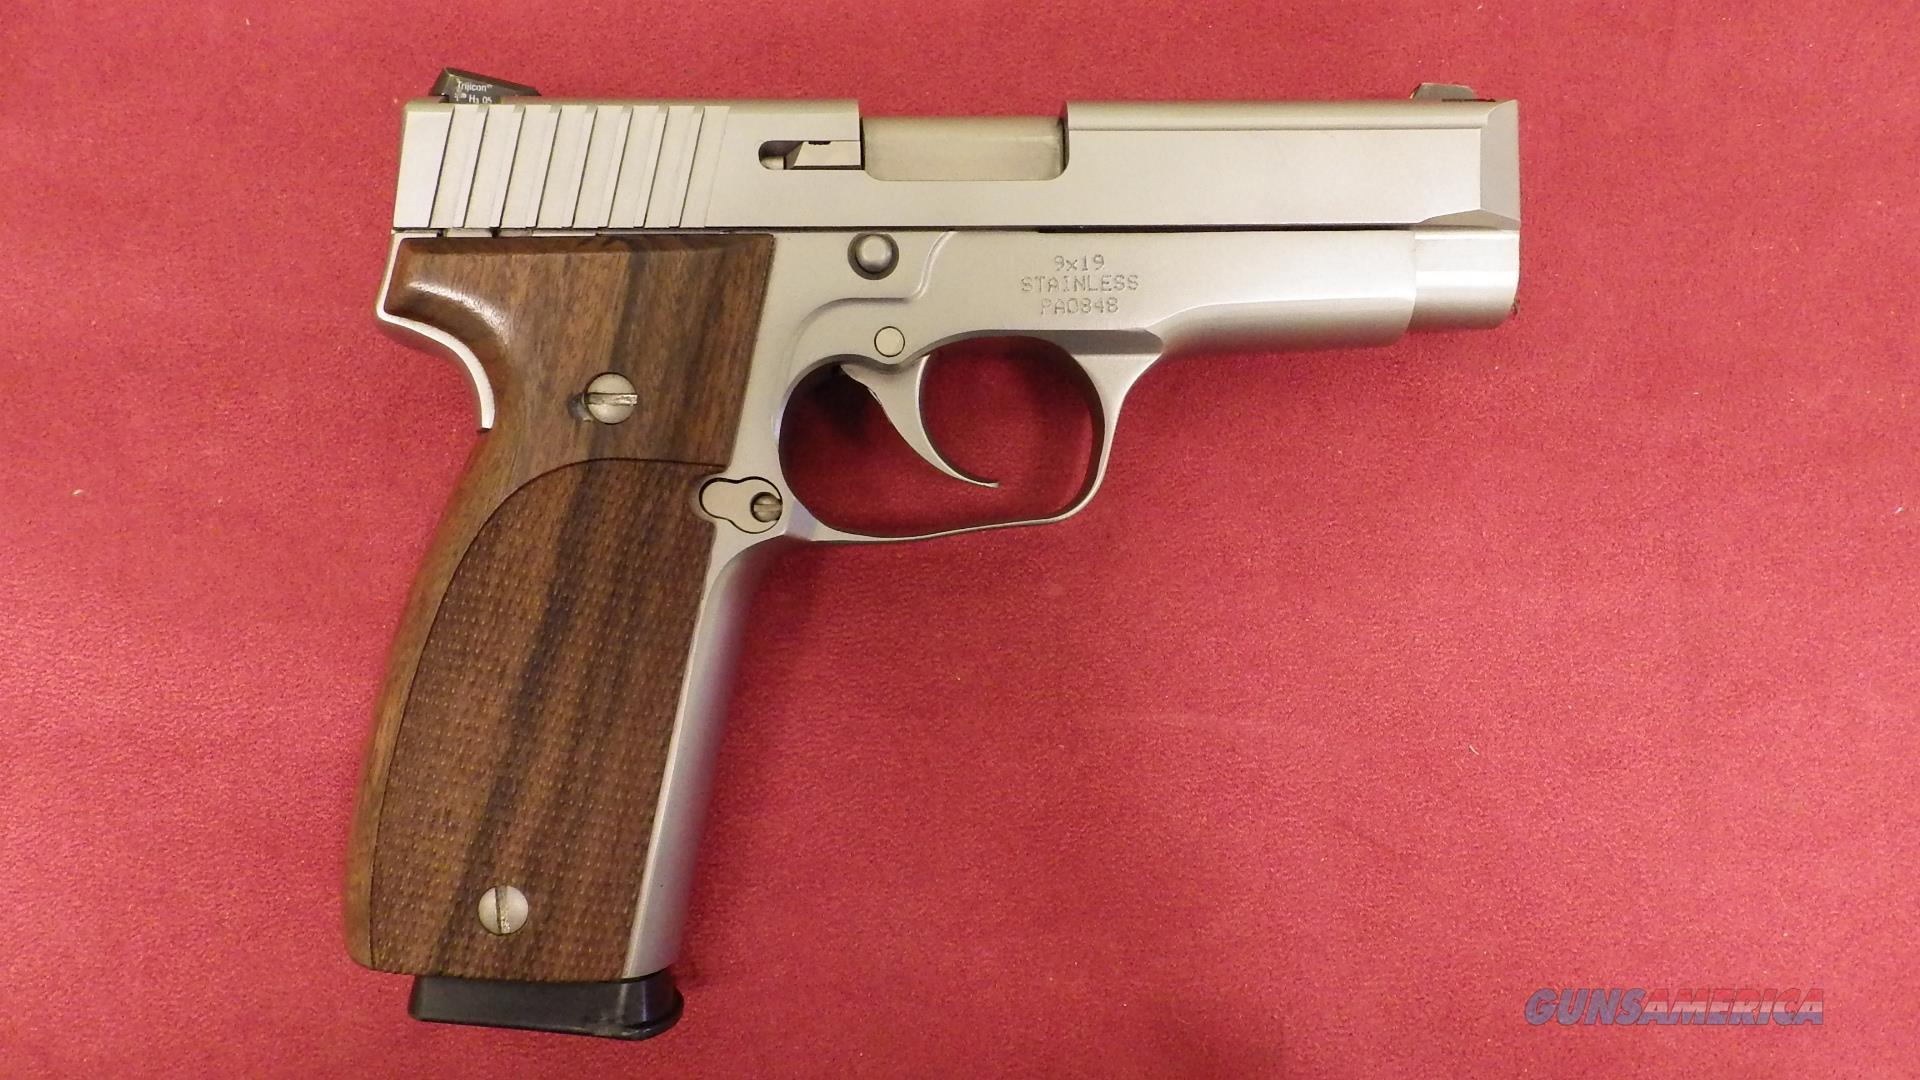 Kahr T-9  9mm  Guns > Pistols > Kahr Pistols